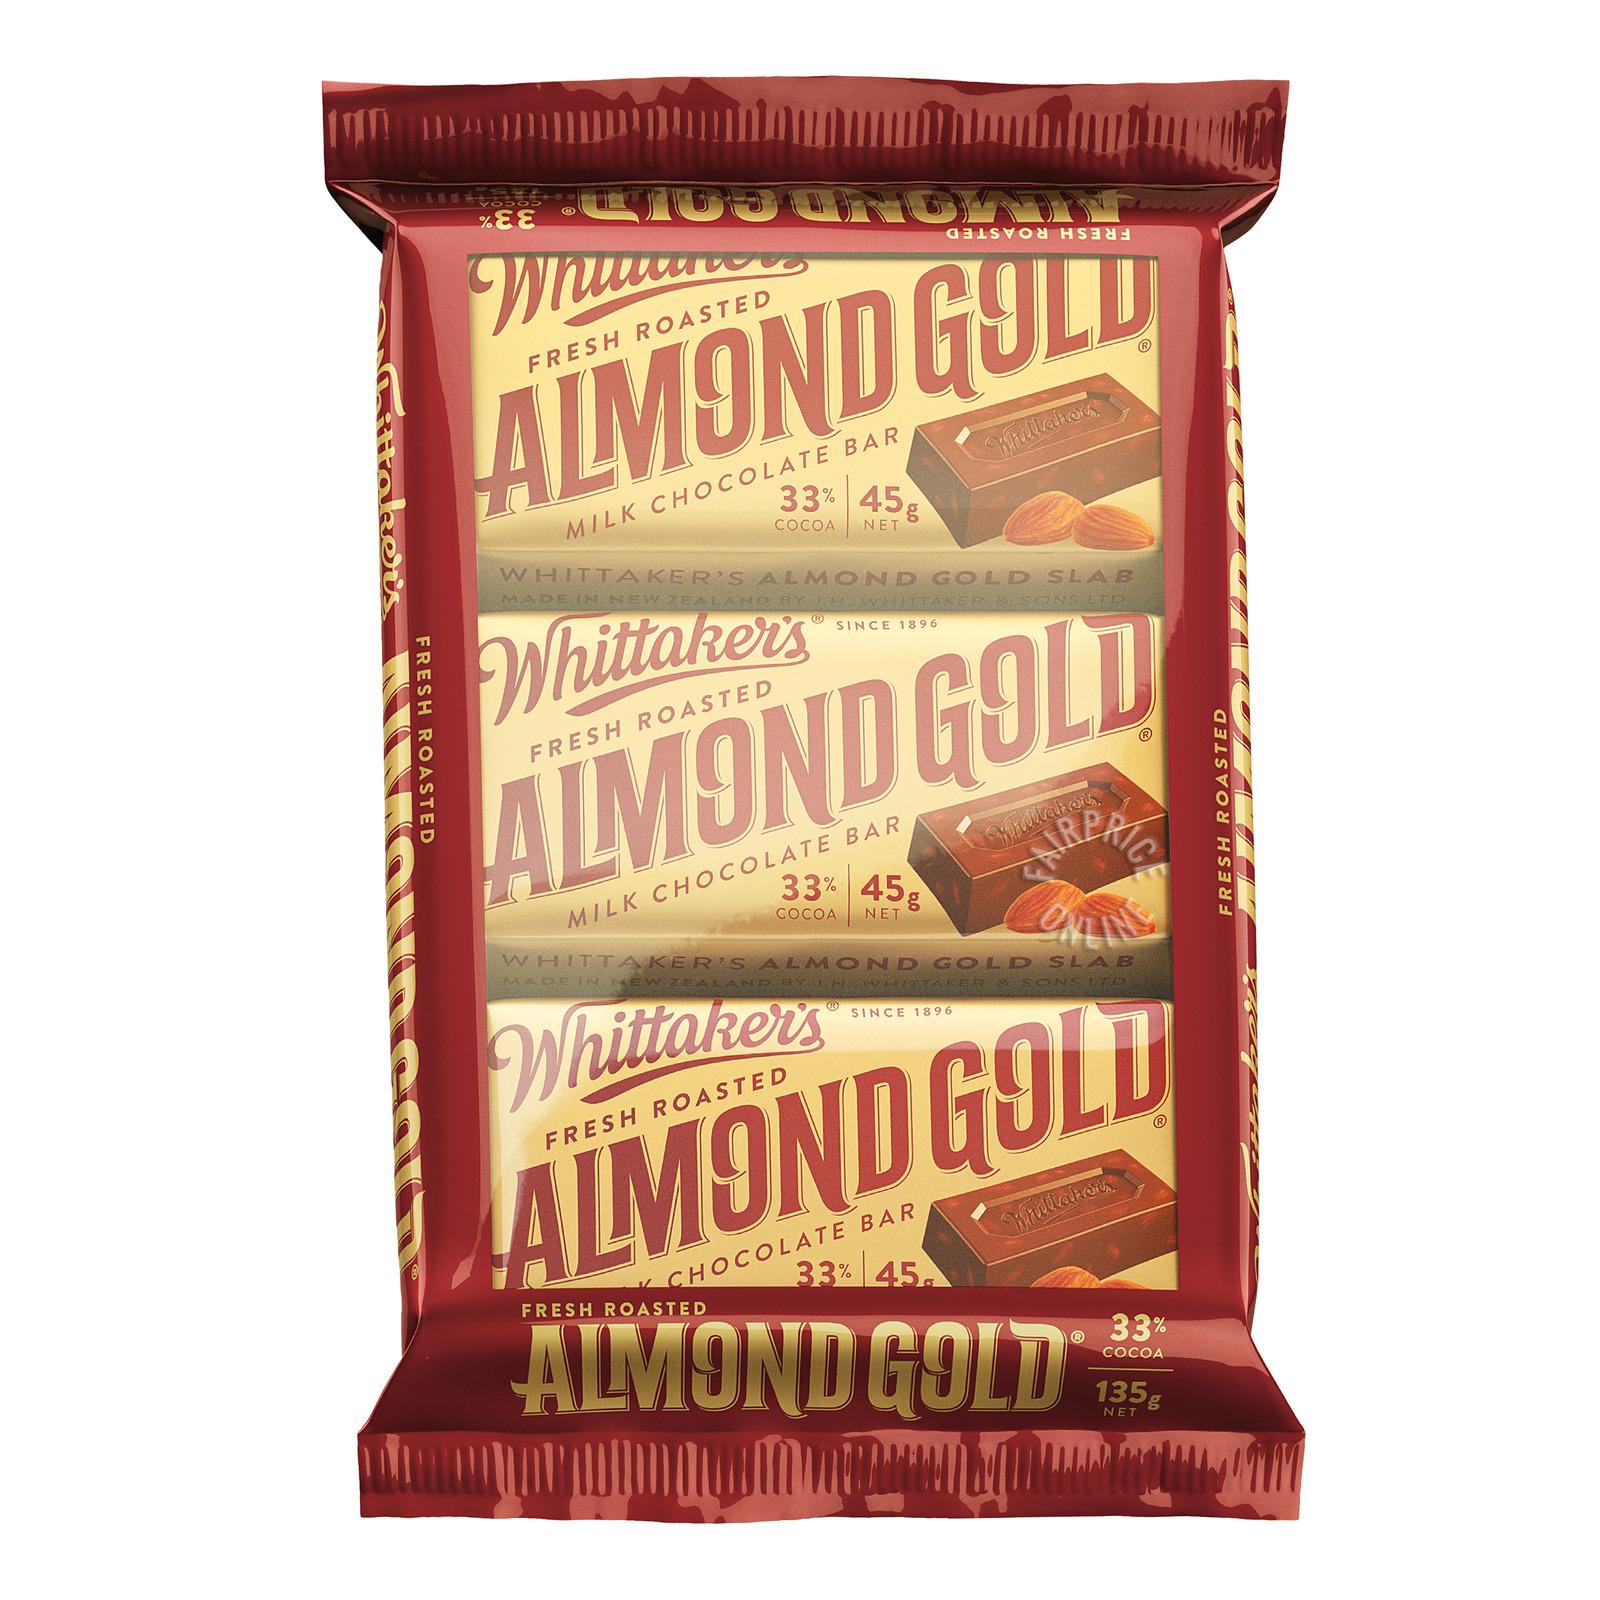 Whittaker's Milk Chocolate Bar - Almond Gold